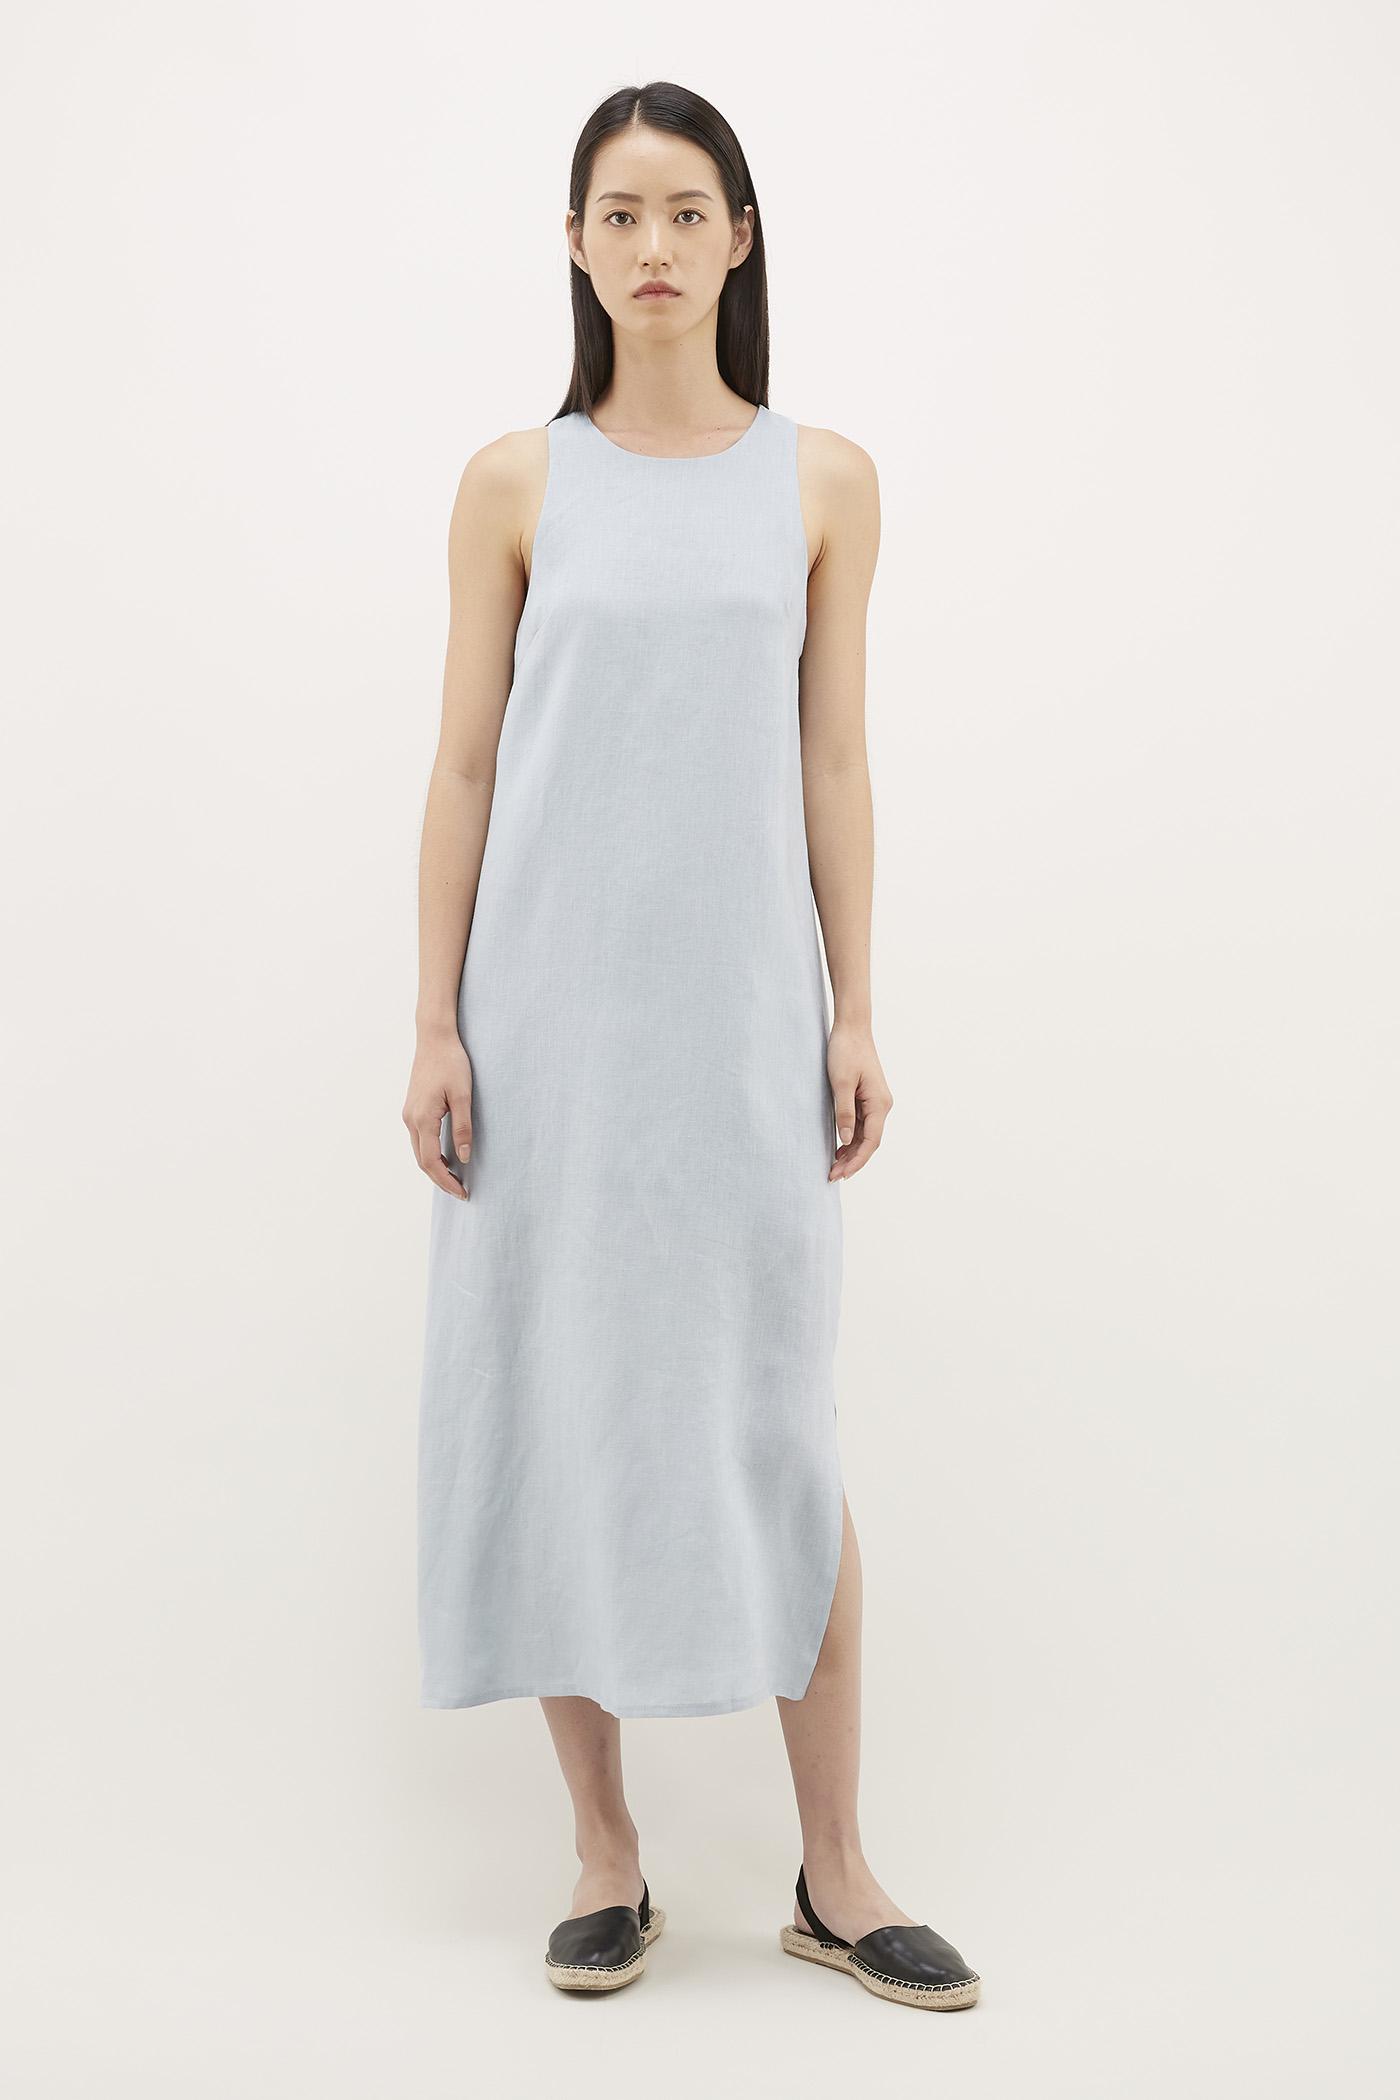 Felania Linen Dress